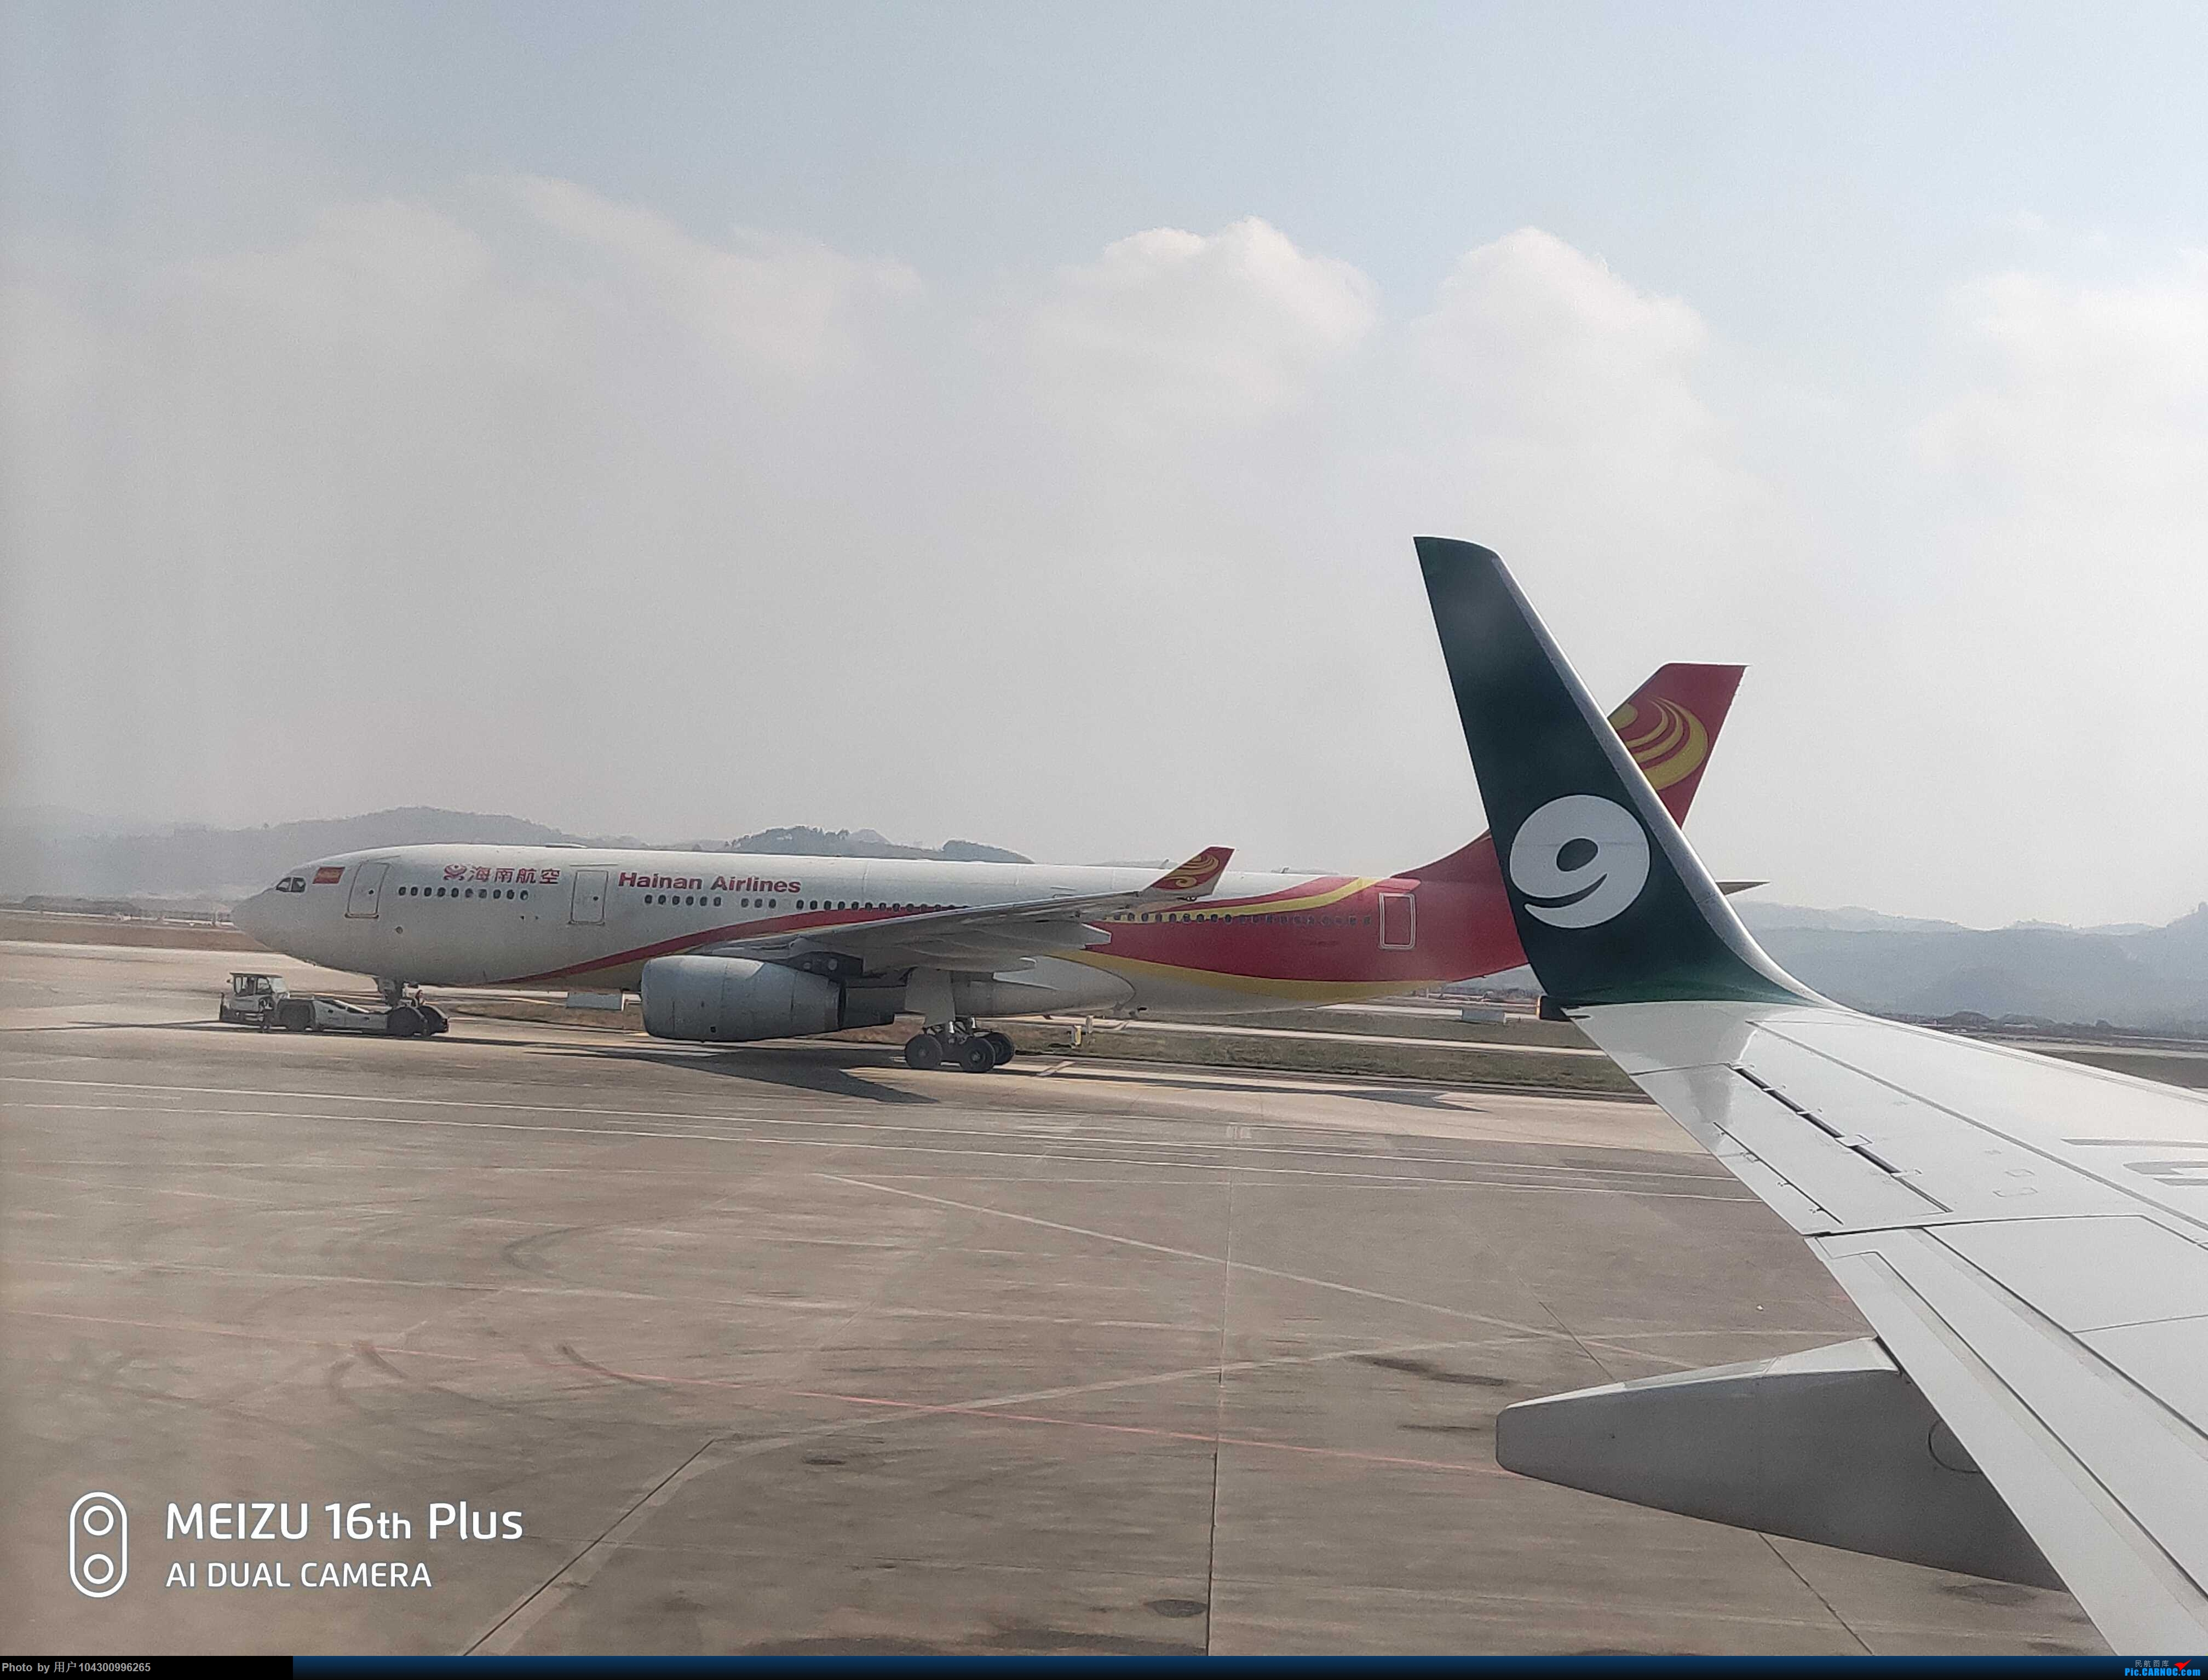 Re:[原创]DM游记之AQ&TV贵阳-兰州往返 AIRBUS A330-200 B-6116 中国贵阳龙洞堡国际机场